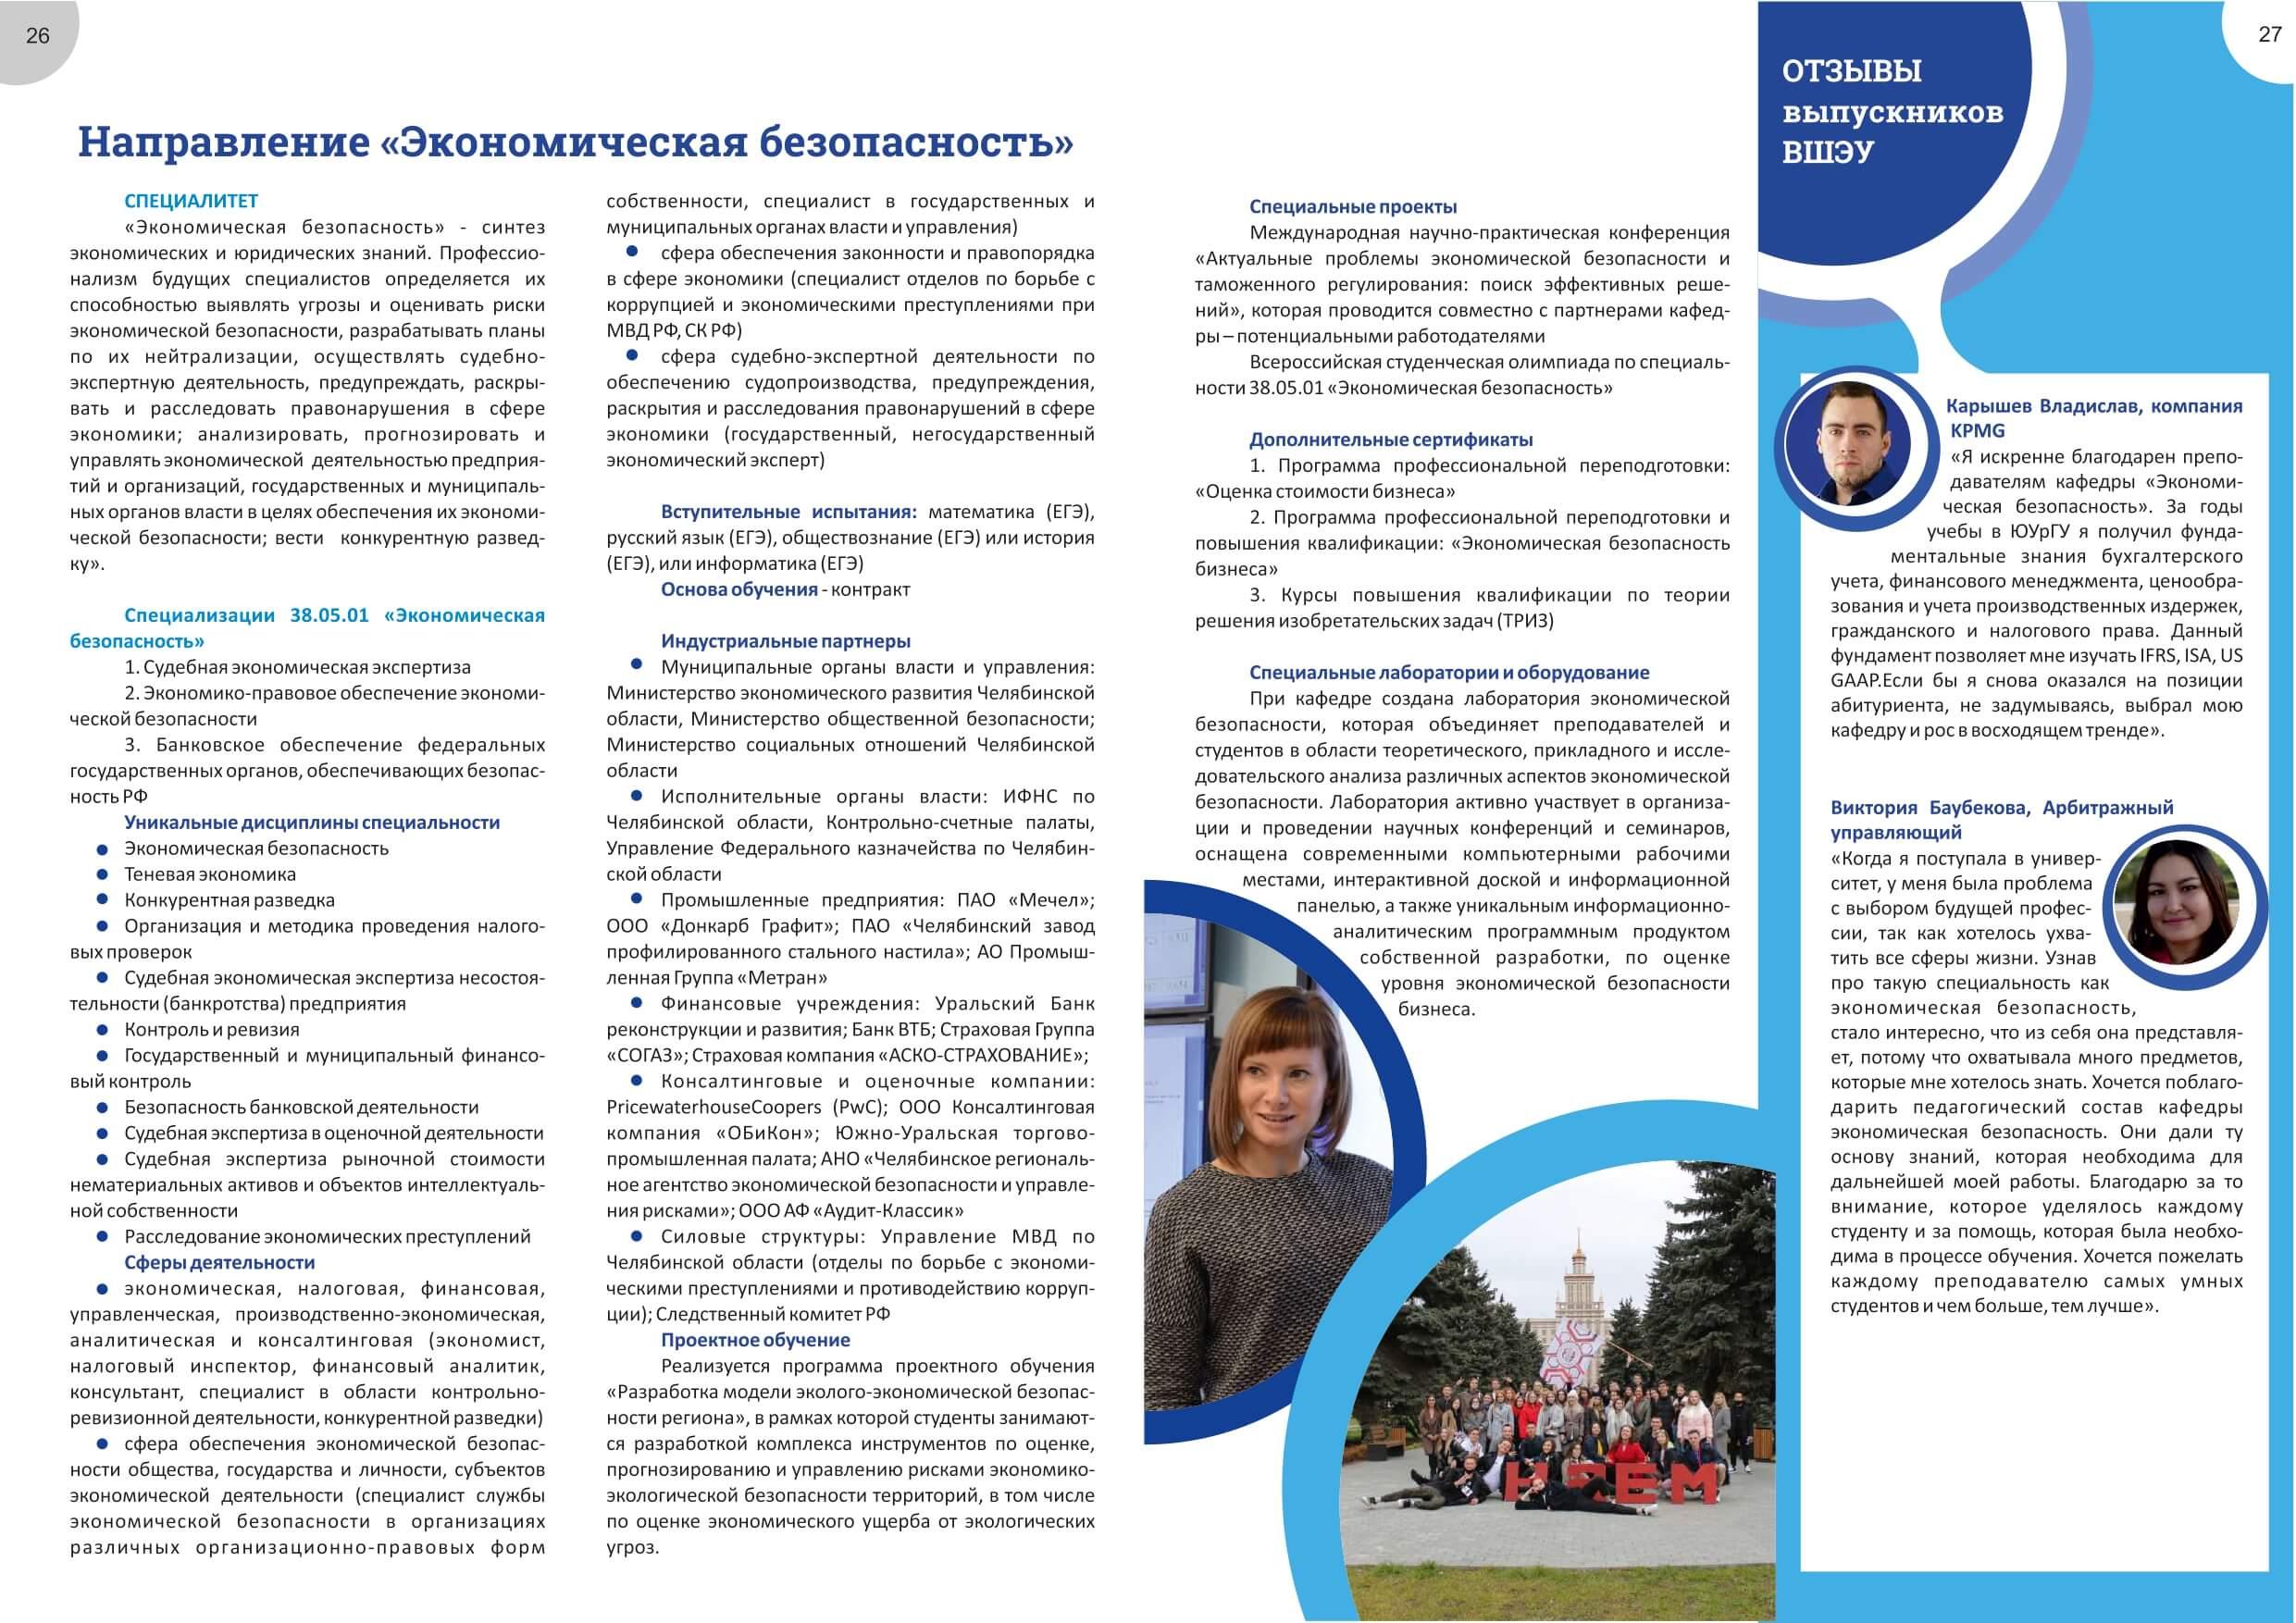 ВШЭУ Прием абитуриентов 2021_pages-to-jpg-0014